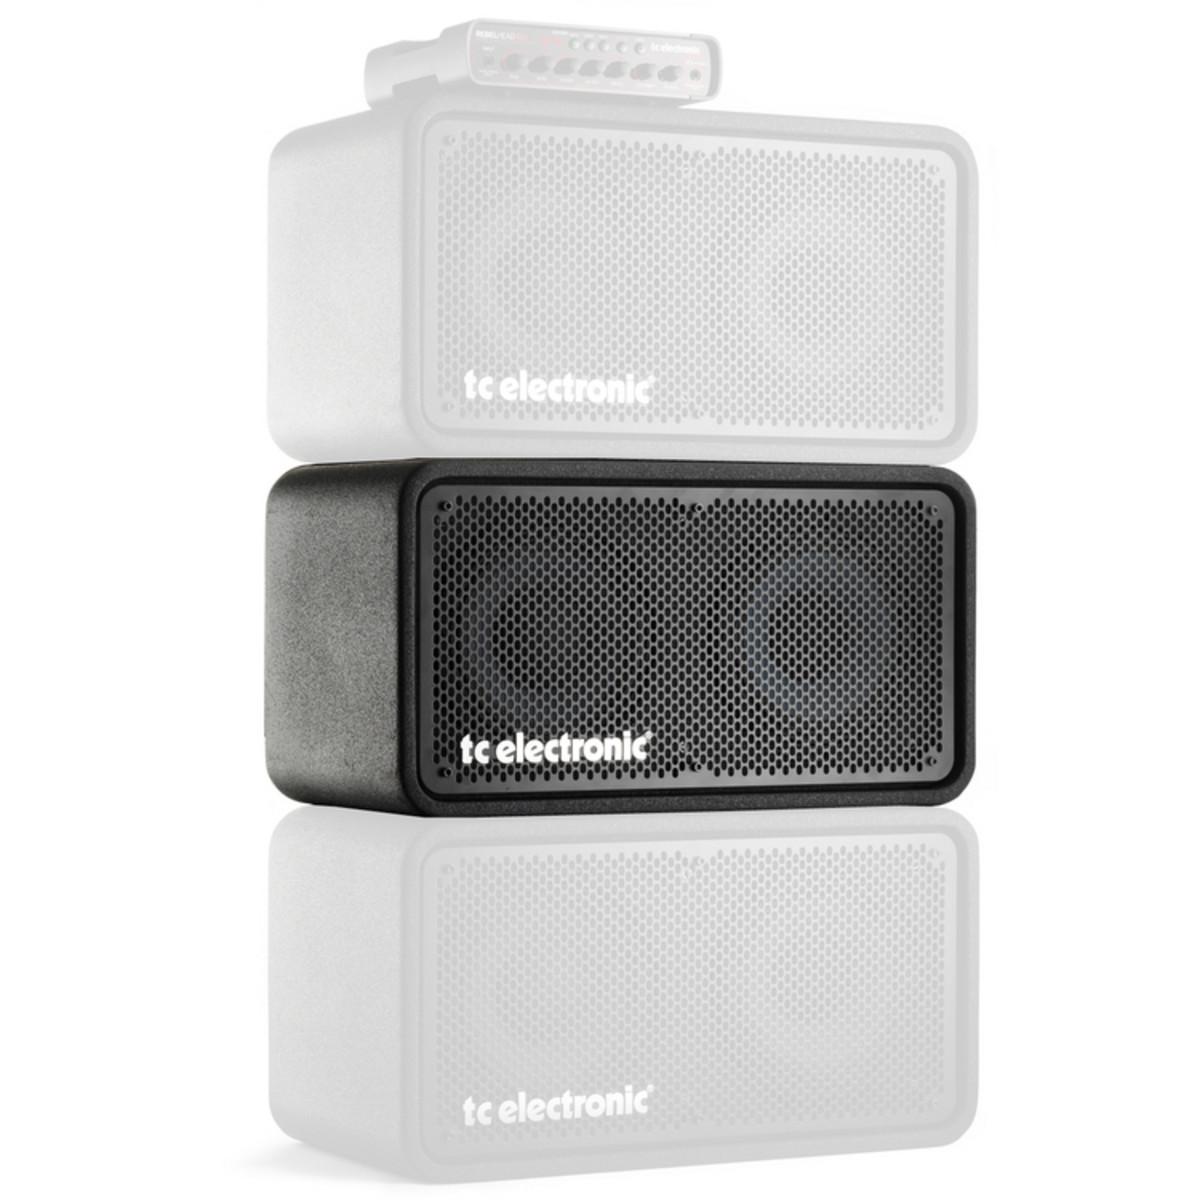 tc electronic rebelstack rs210 bass speaker cab 2 x 10 39 39 at gear4music. Black Bedroom Furniture Sets. Home Design Ideas